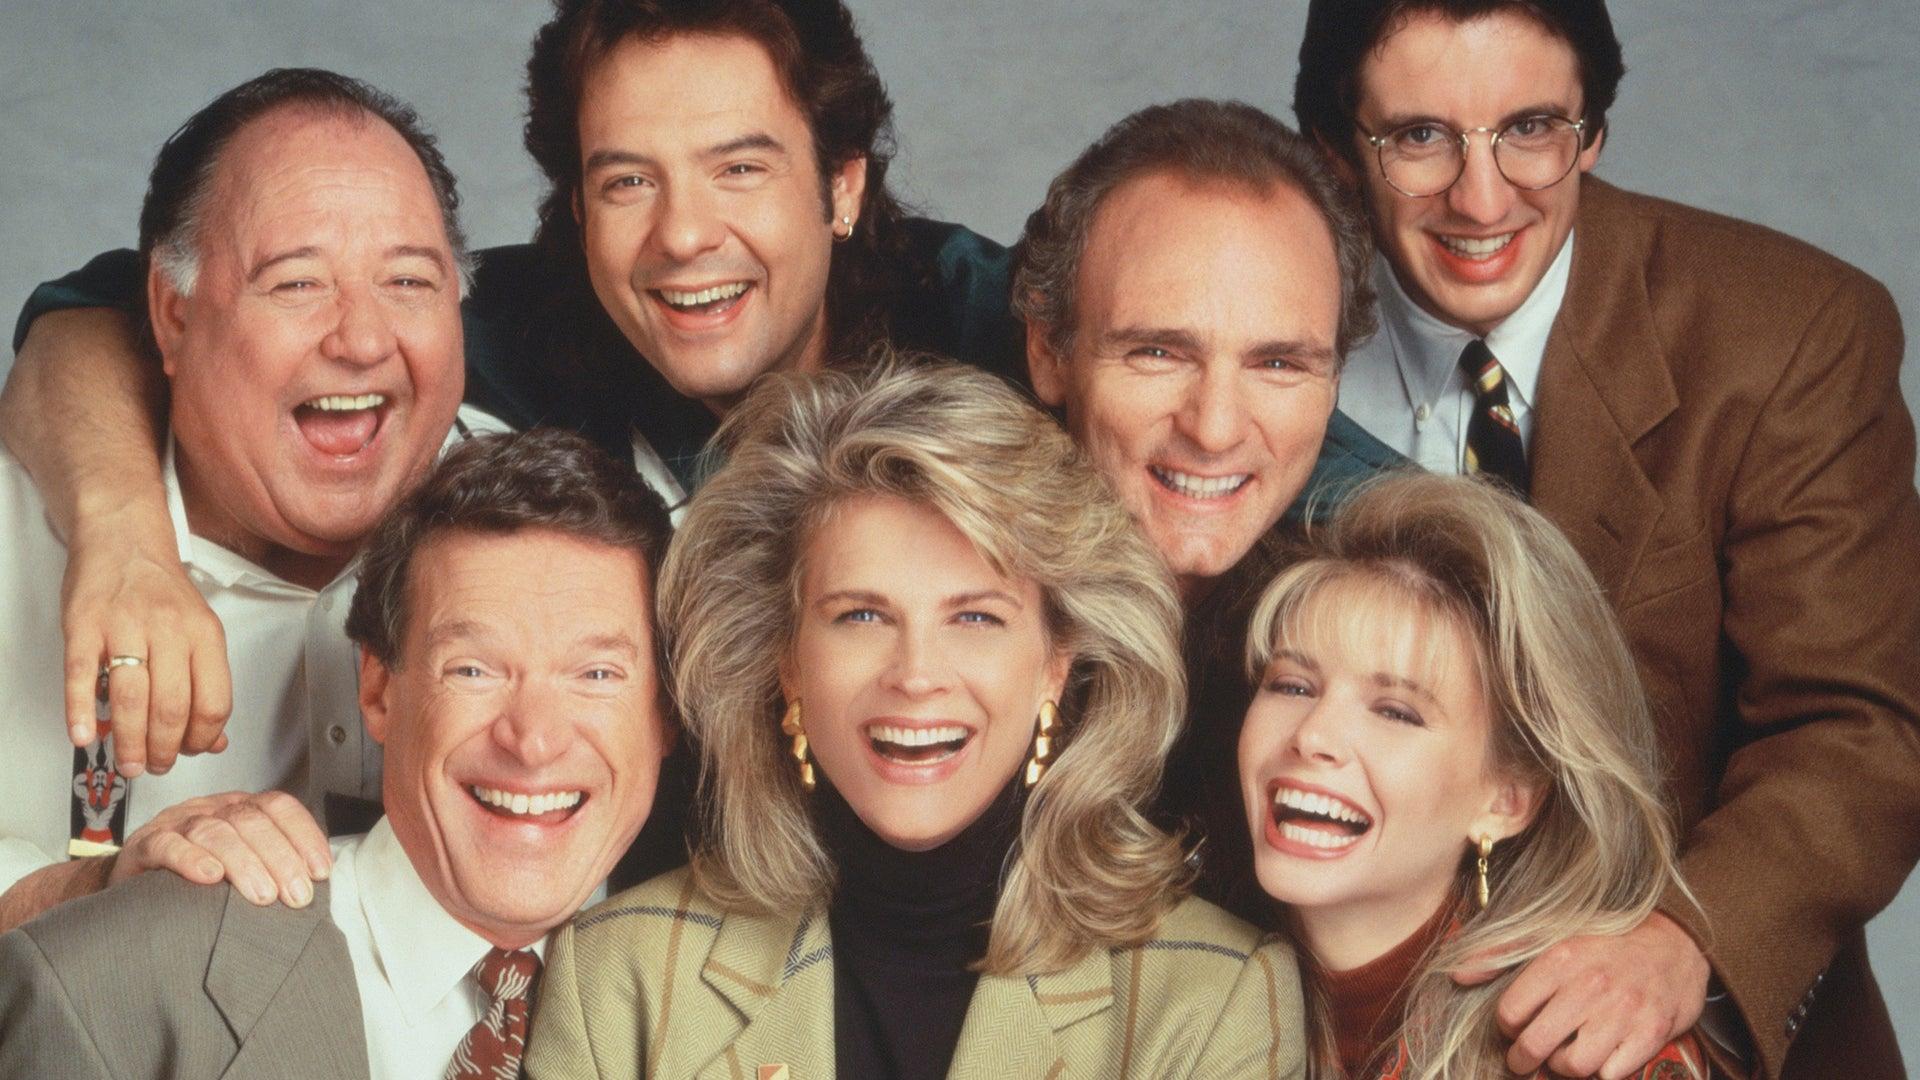 Charles Kimbrough, Candice Bergen, Faith Ford, Pat Corley, Robert Pastorelli, Joe Regalbuto, and Grant Shaud; Murphy Brown